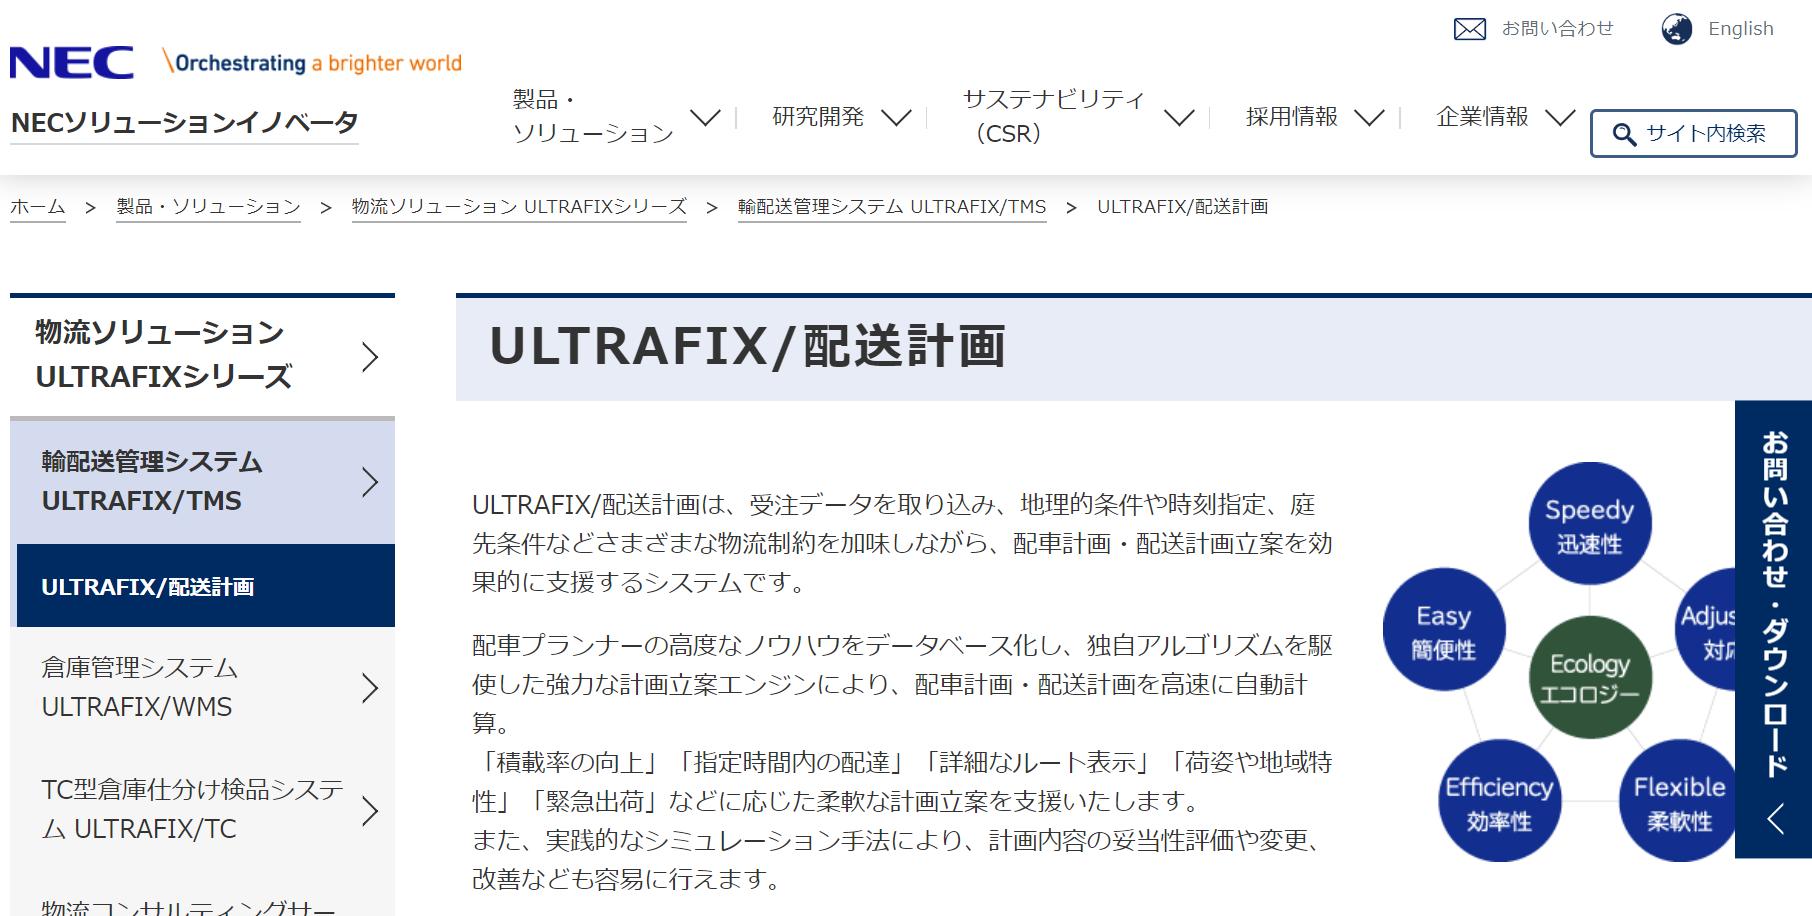 ULTRAFIX/配送計画